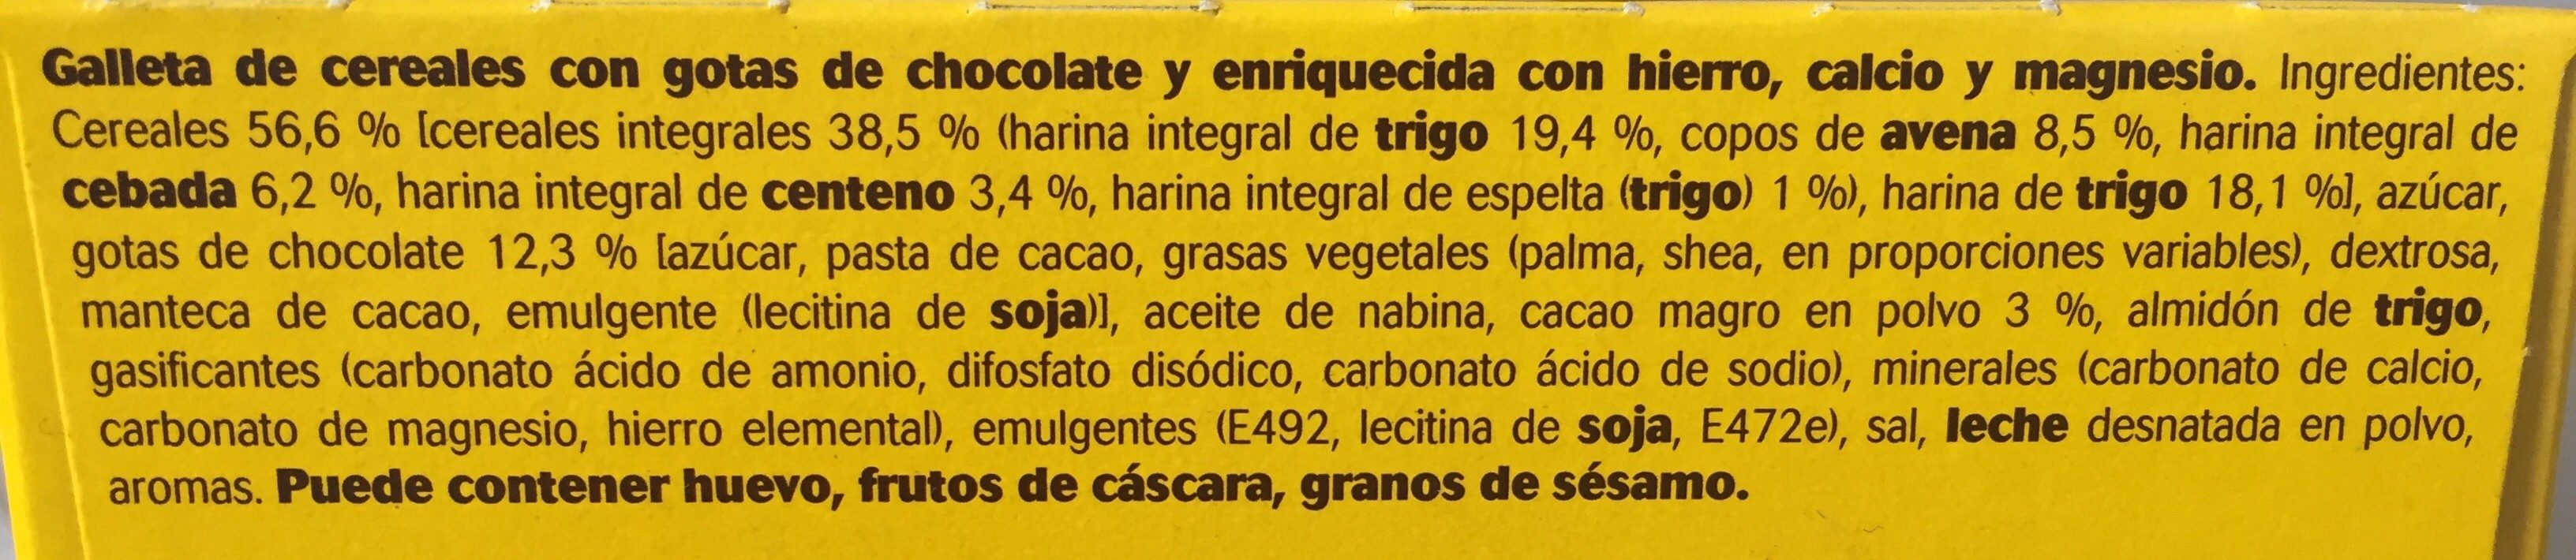 Galleta Belvita 5 Cereales Integrales Choco - Ingredientes - es